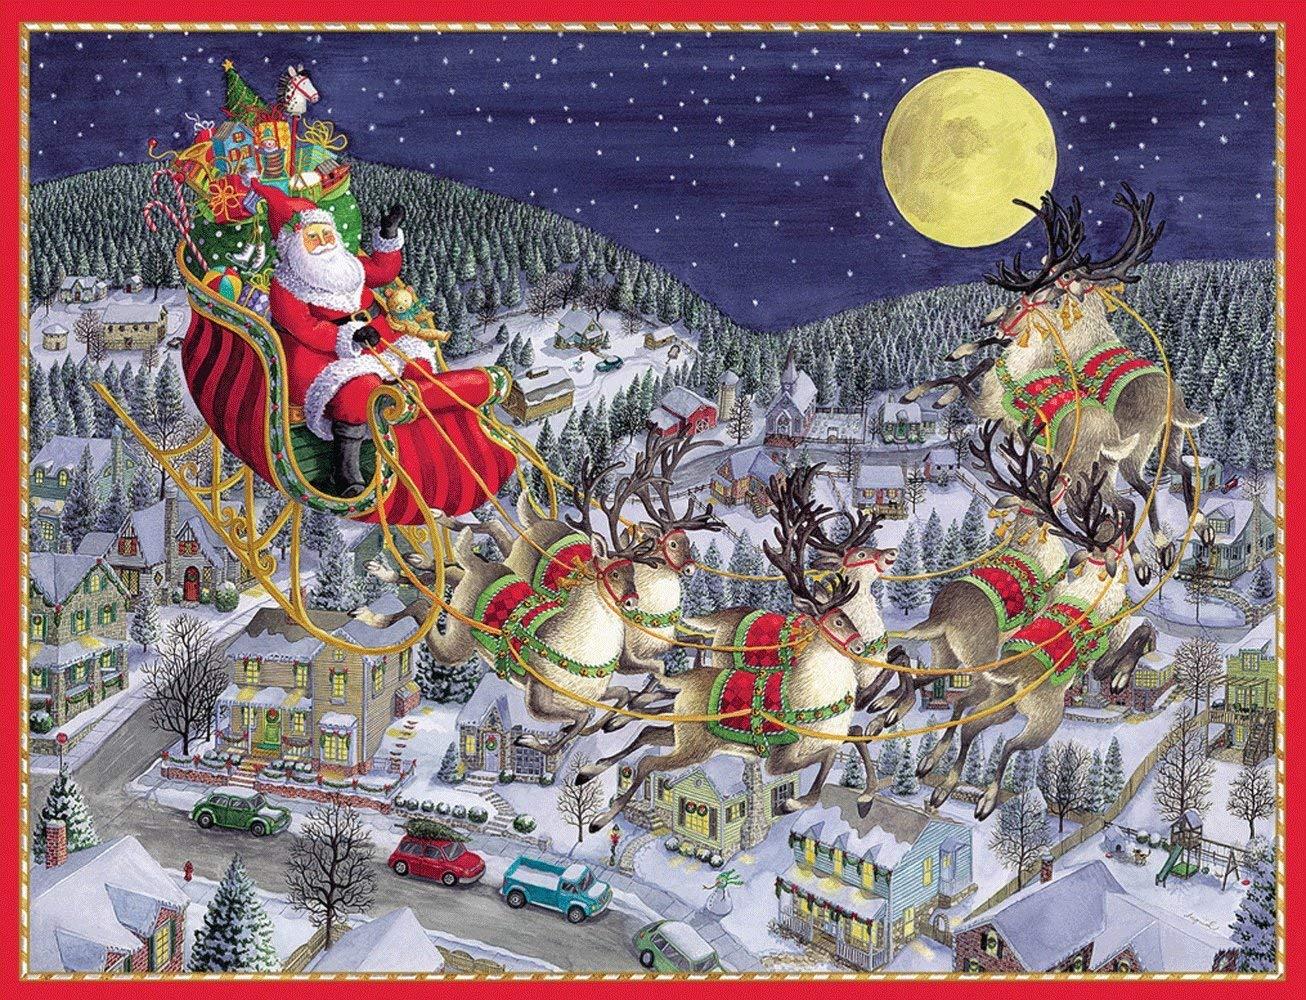 Caspari Christmas Cards.Buy Entertaining With Caspari Santa And Sleigh Over